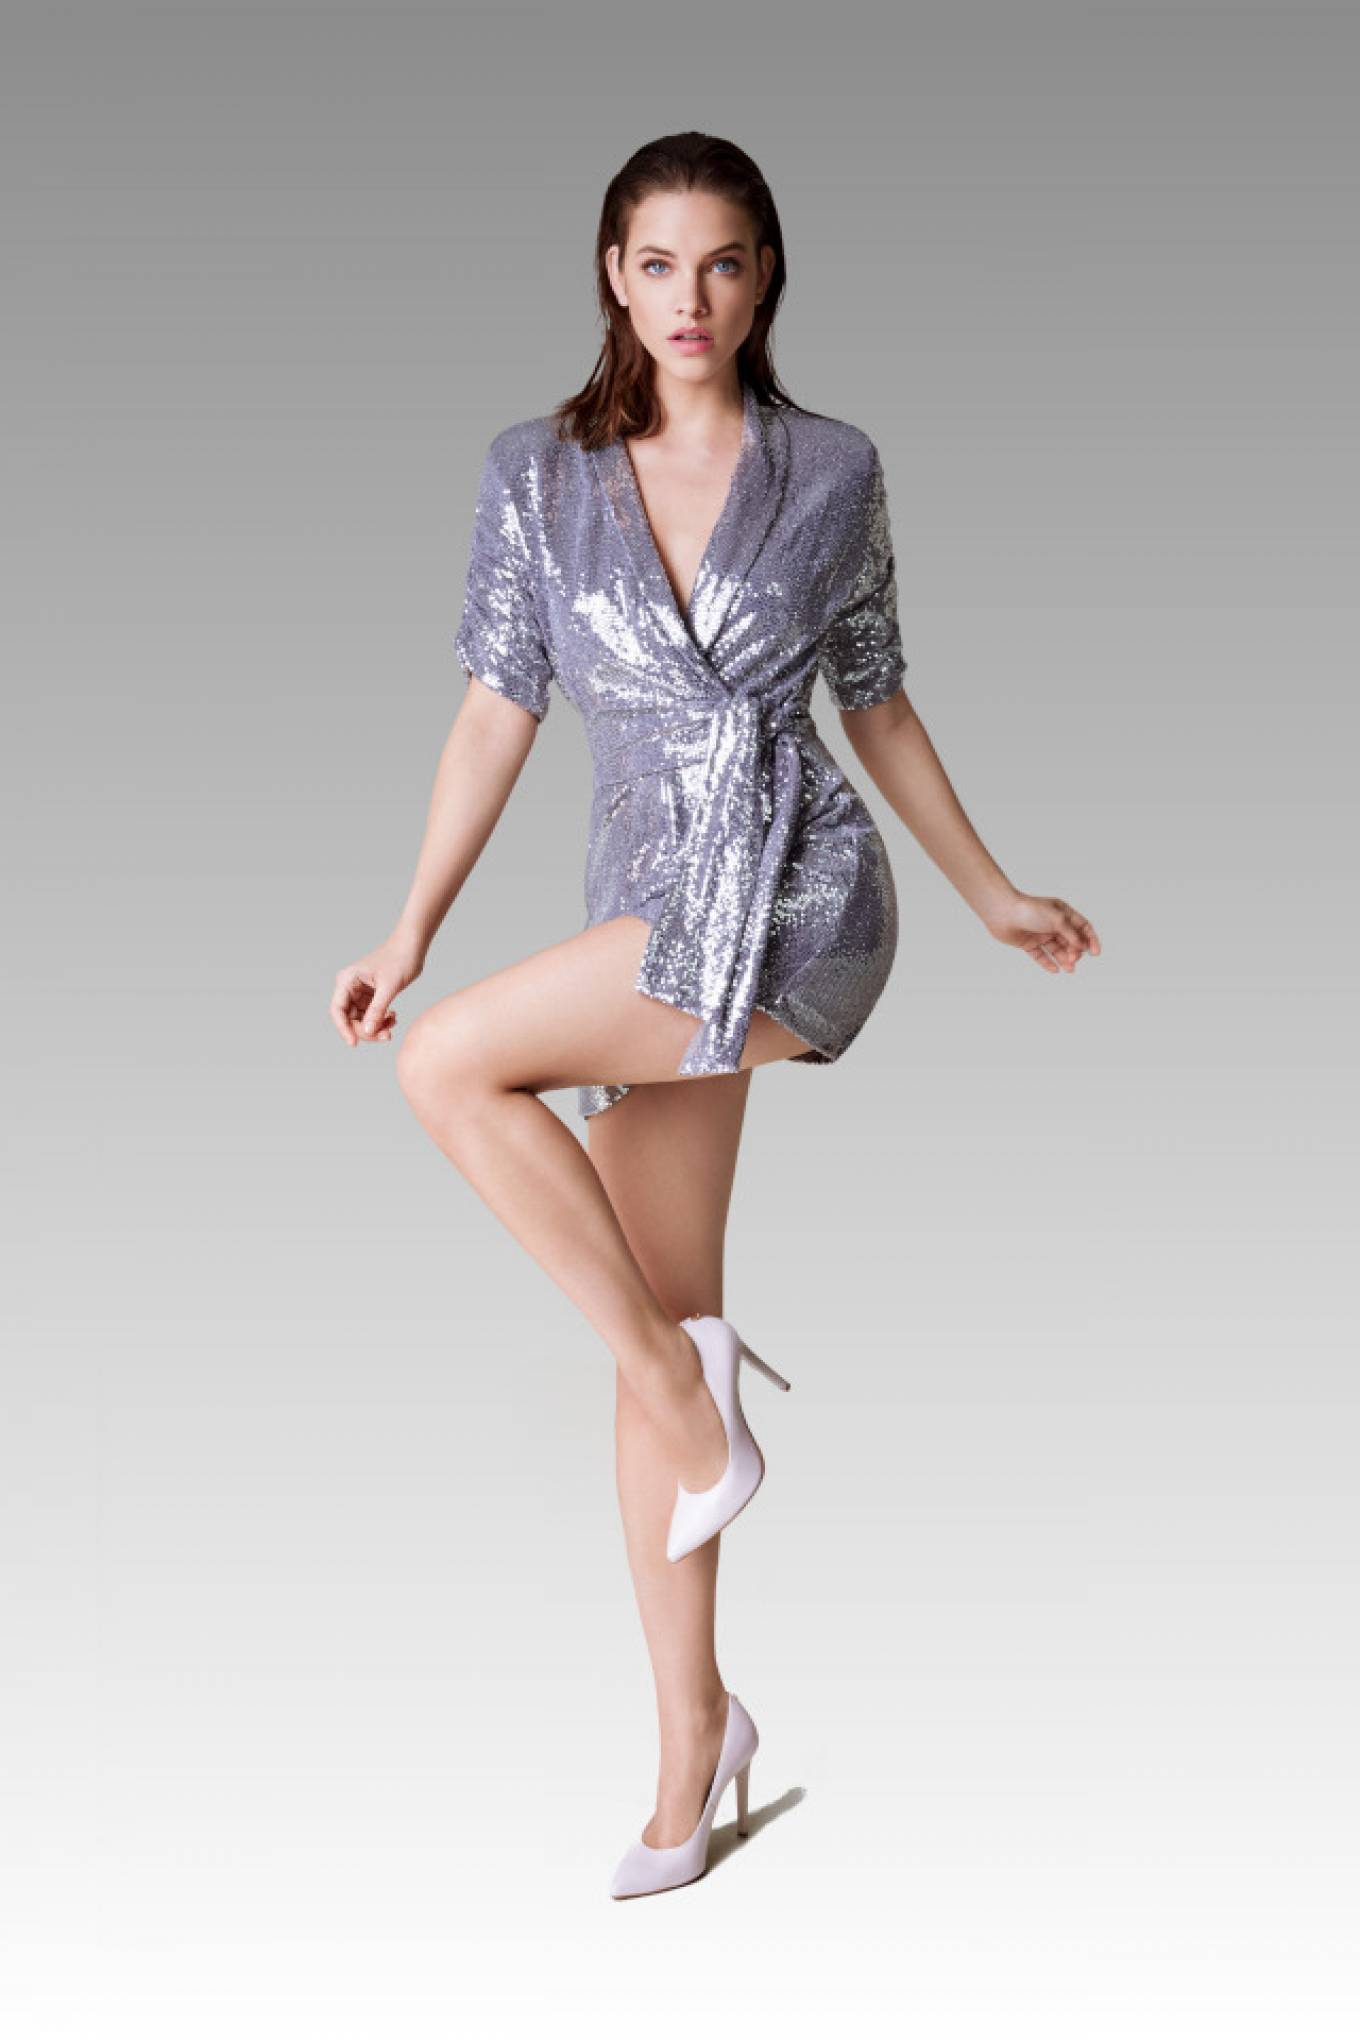 Barbara Palvin - Palvini footwear 2021